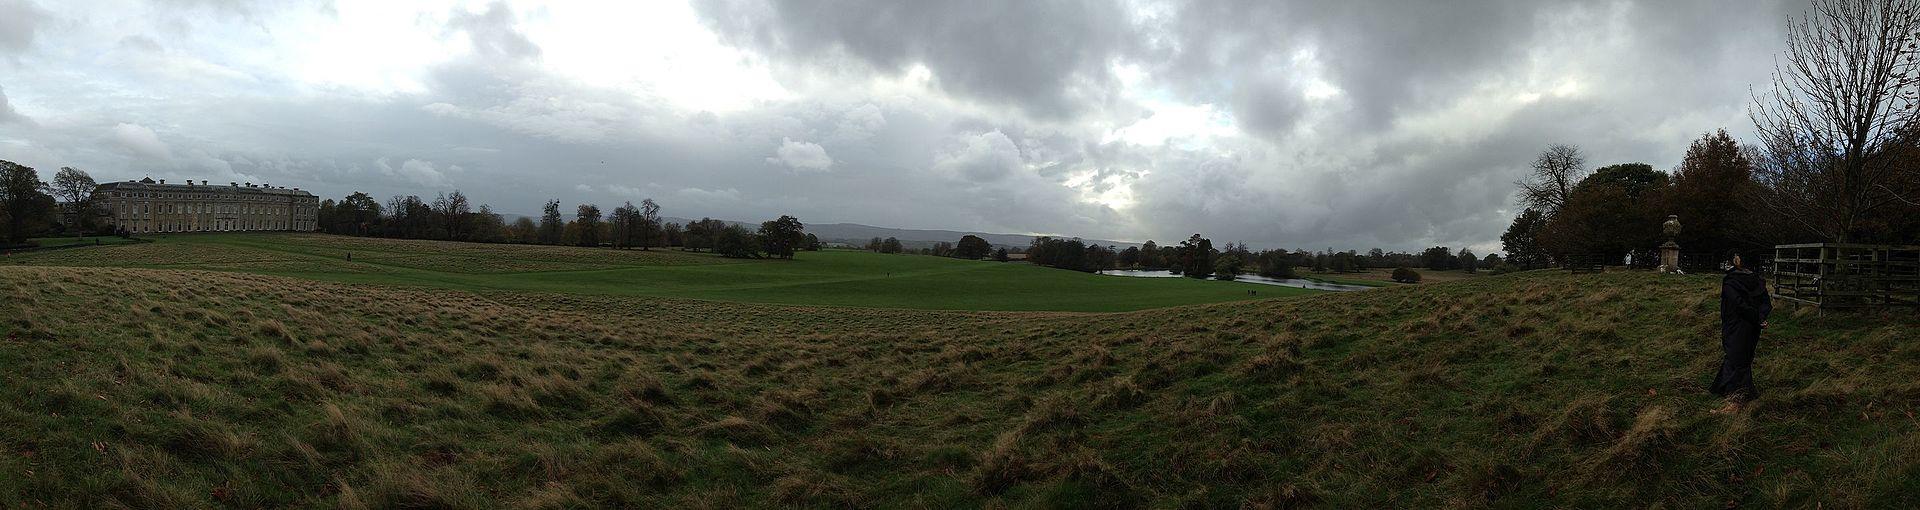 Petworth_House_panorama.jpg